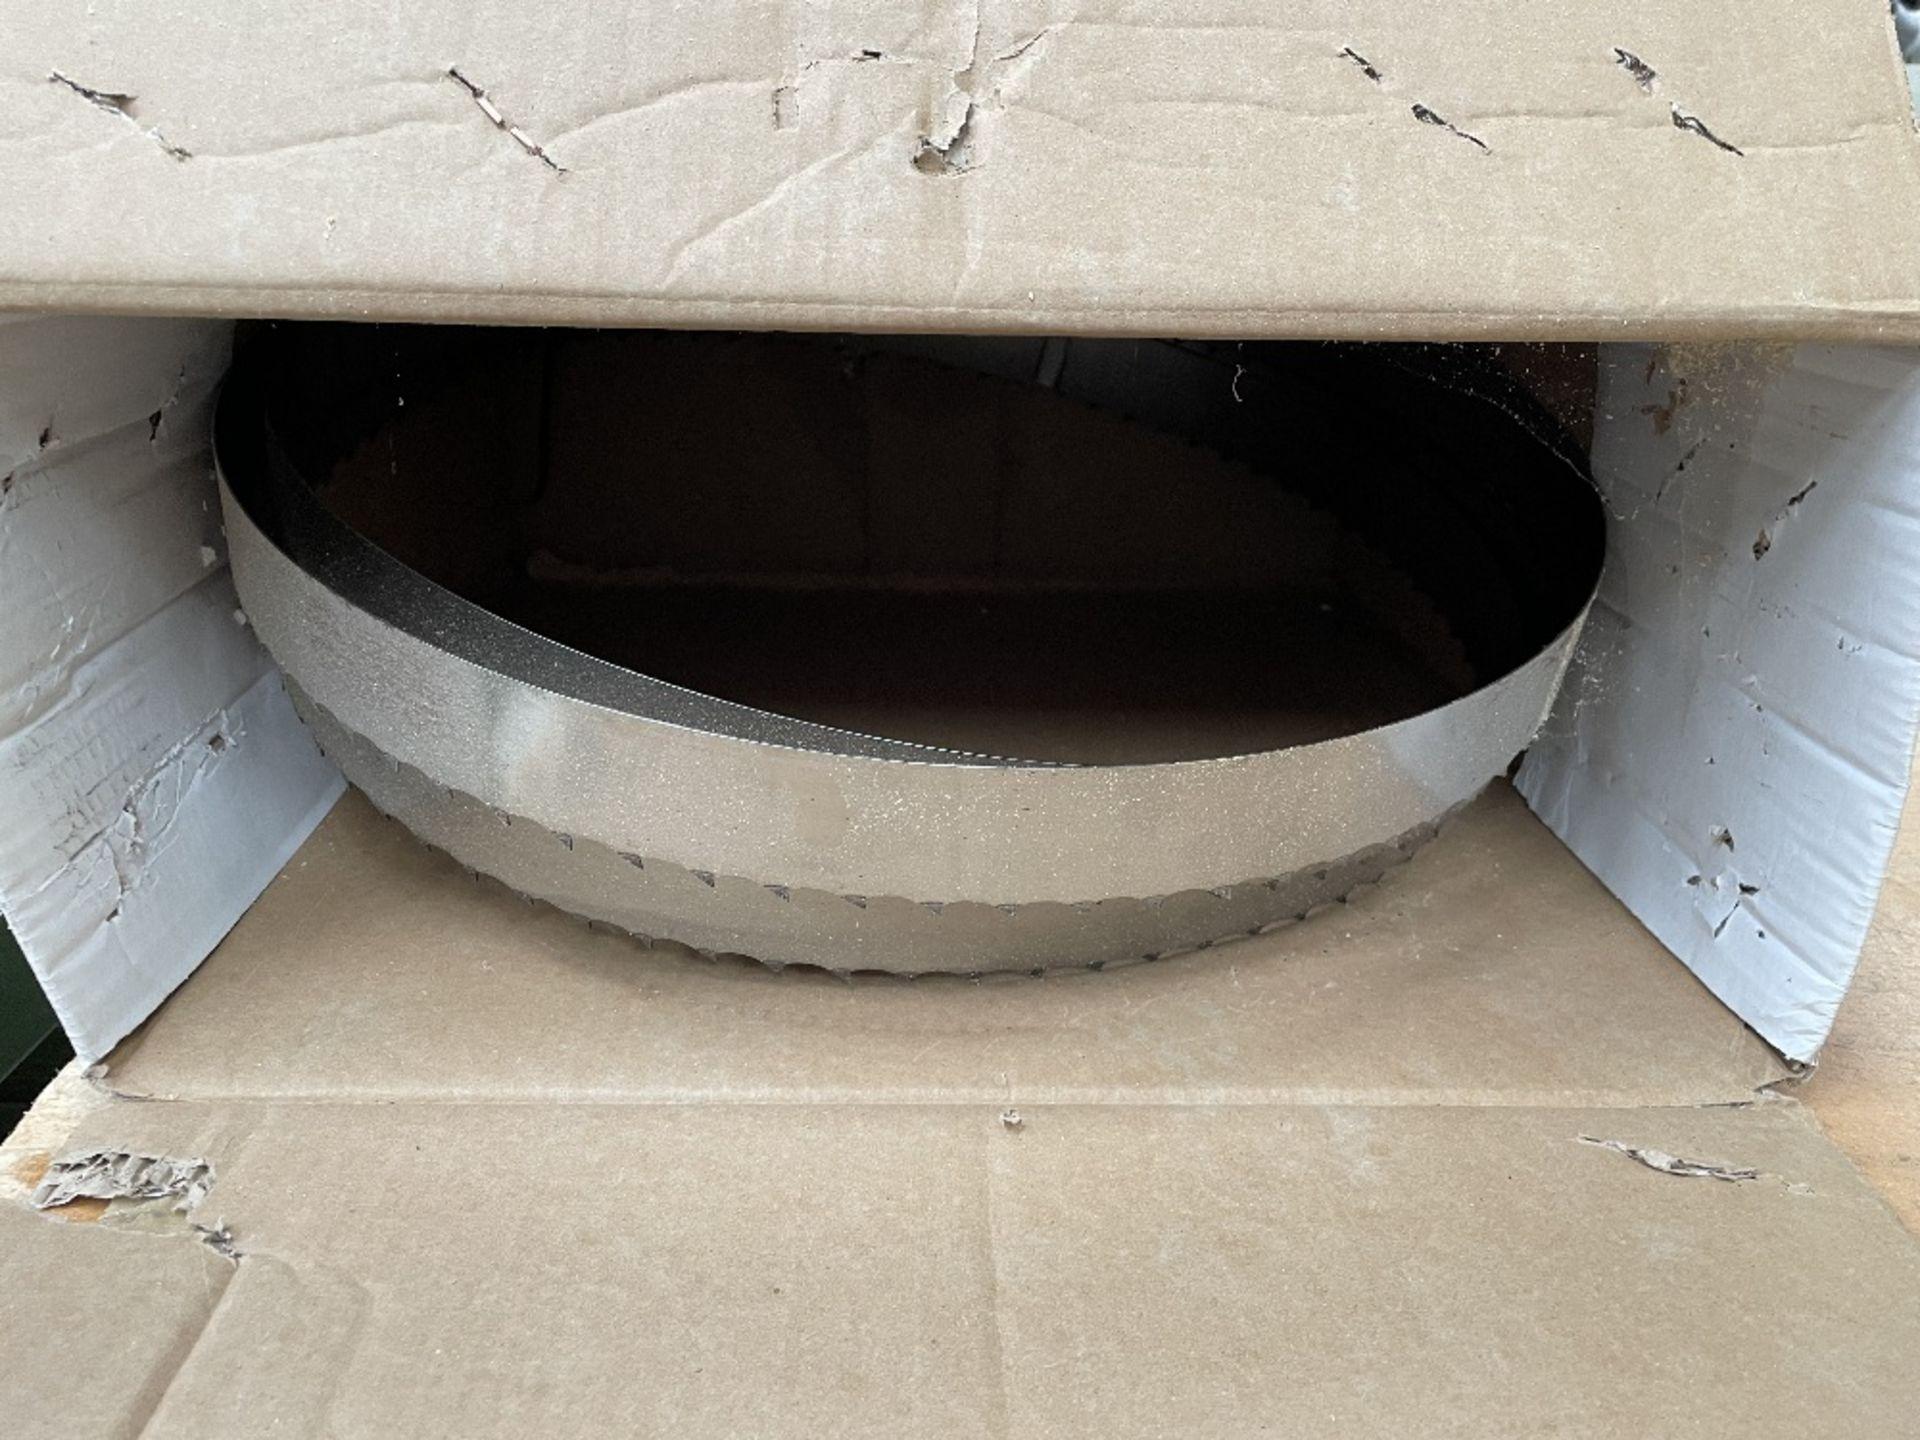 Wadkin Bursgreen Vertical Bandsaw w/ Power Feed - Image 9 of 9